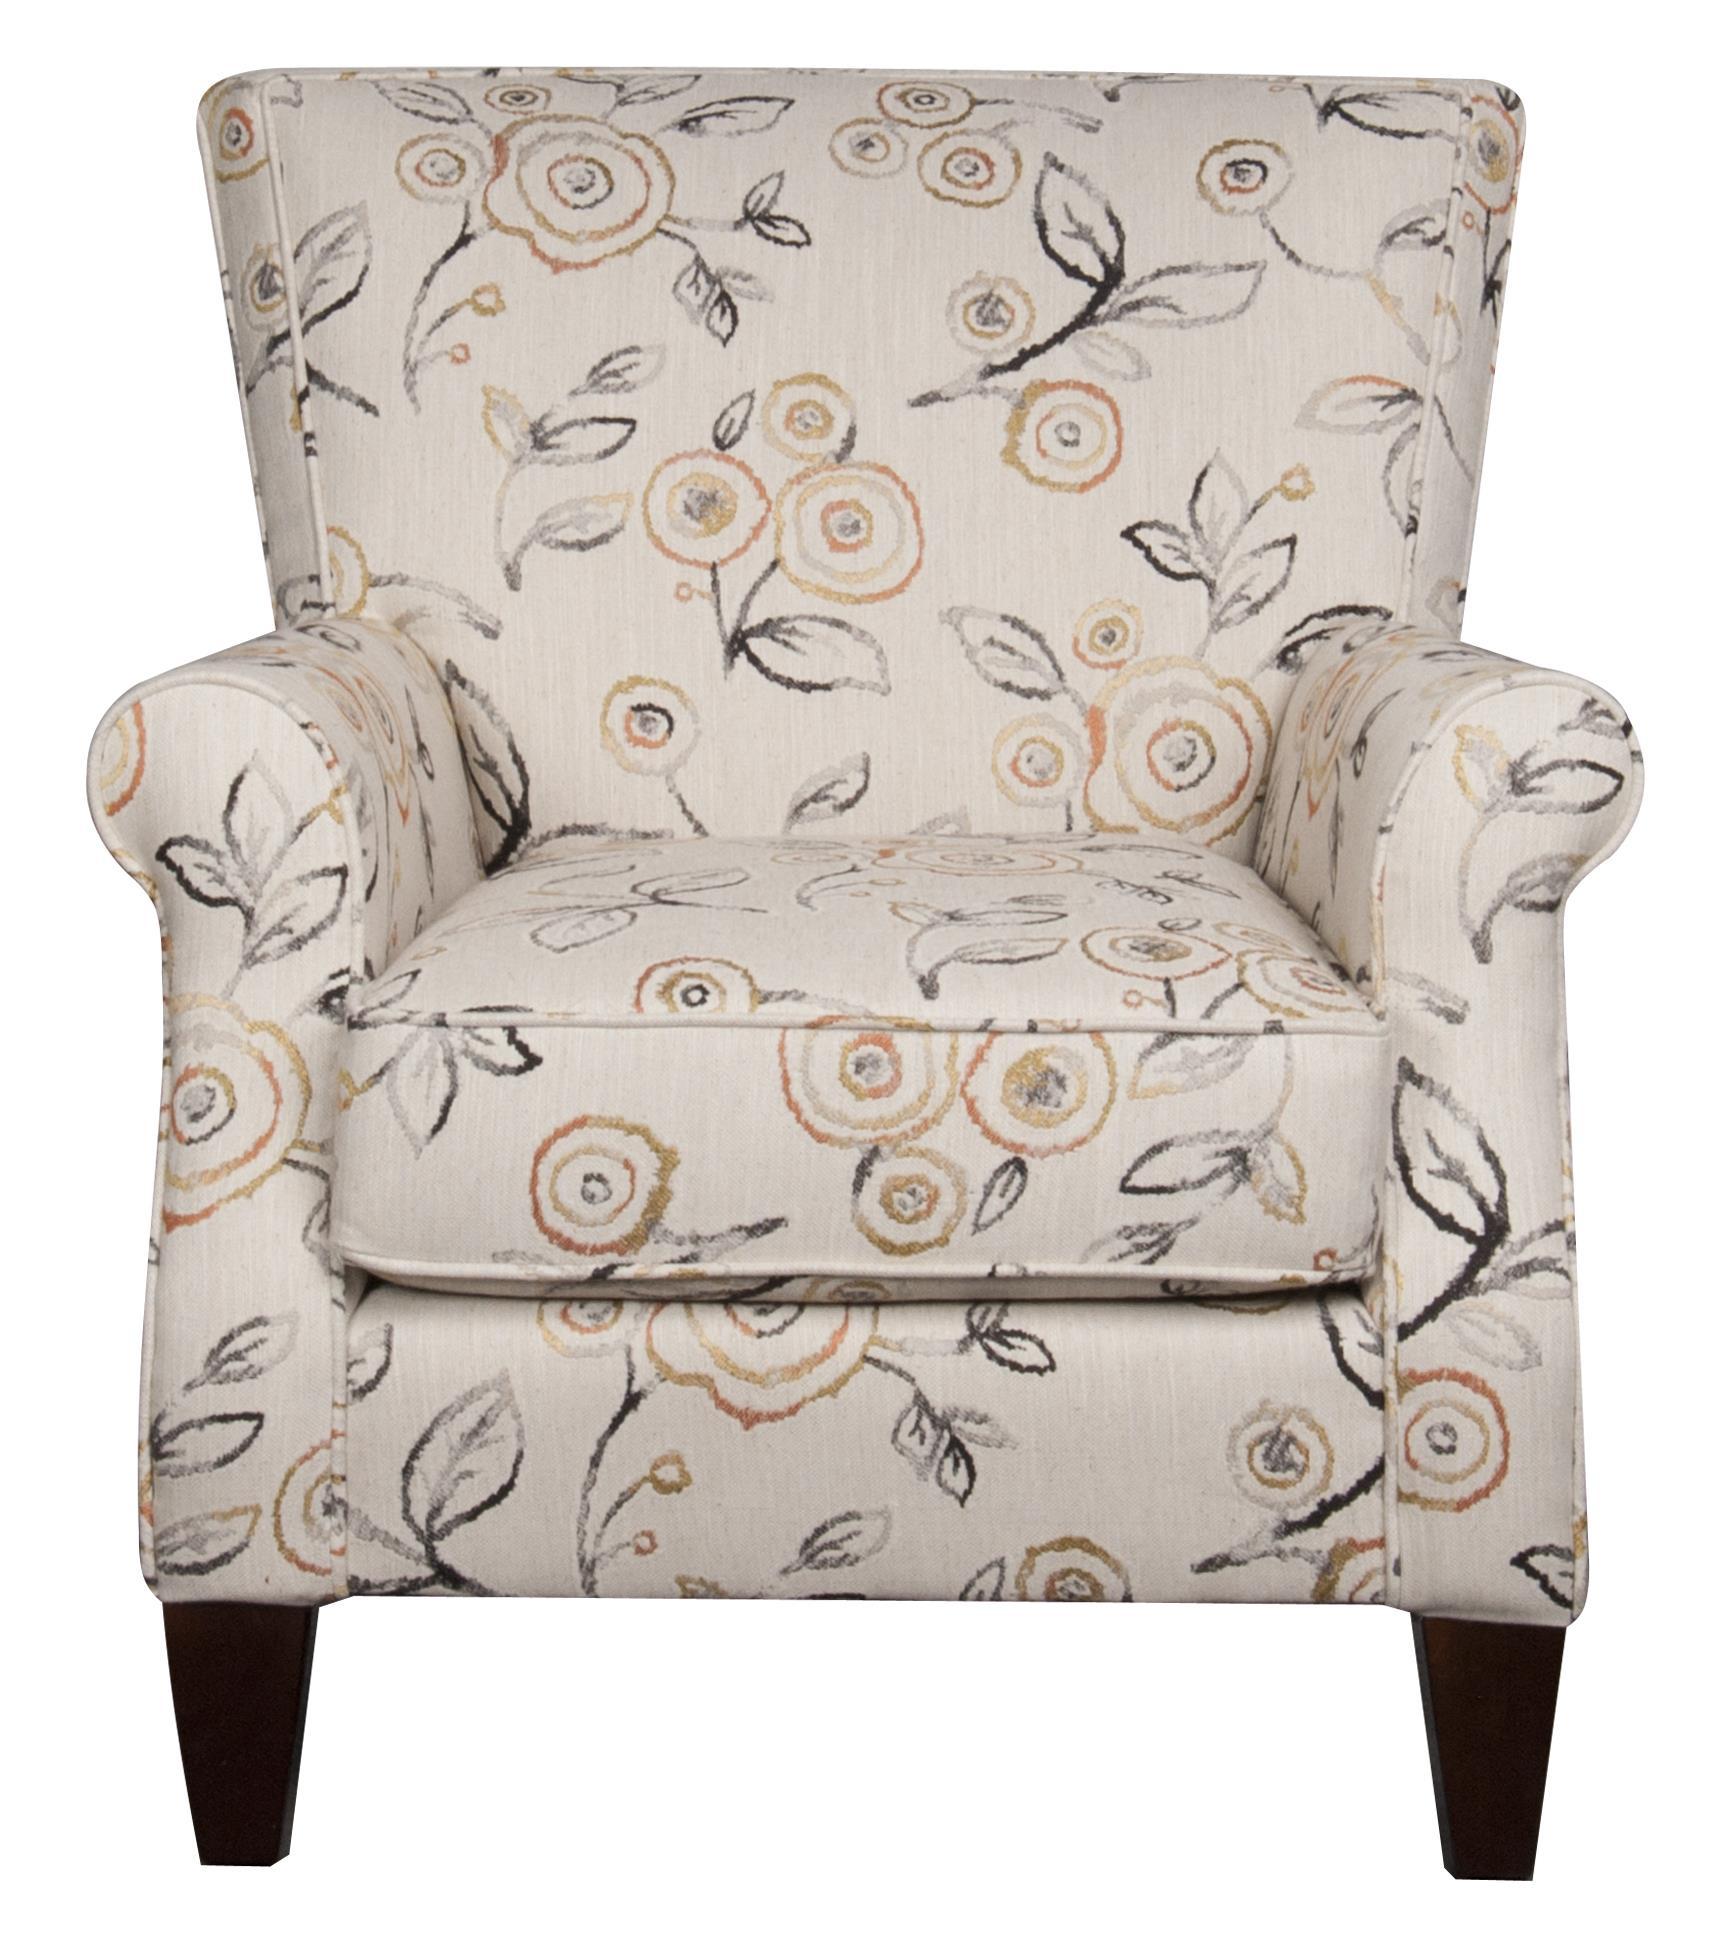 Morris Home Furnishings Sarah Sarah Accent Chair - Item Number: 856895931